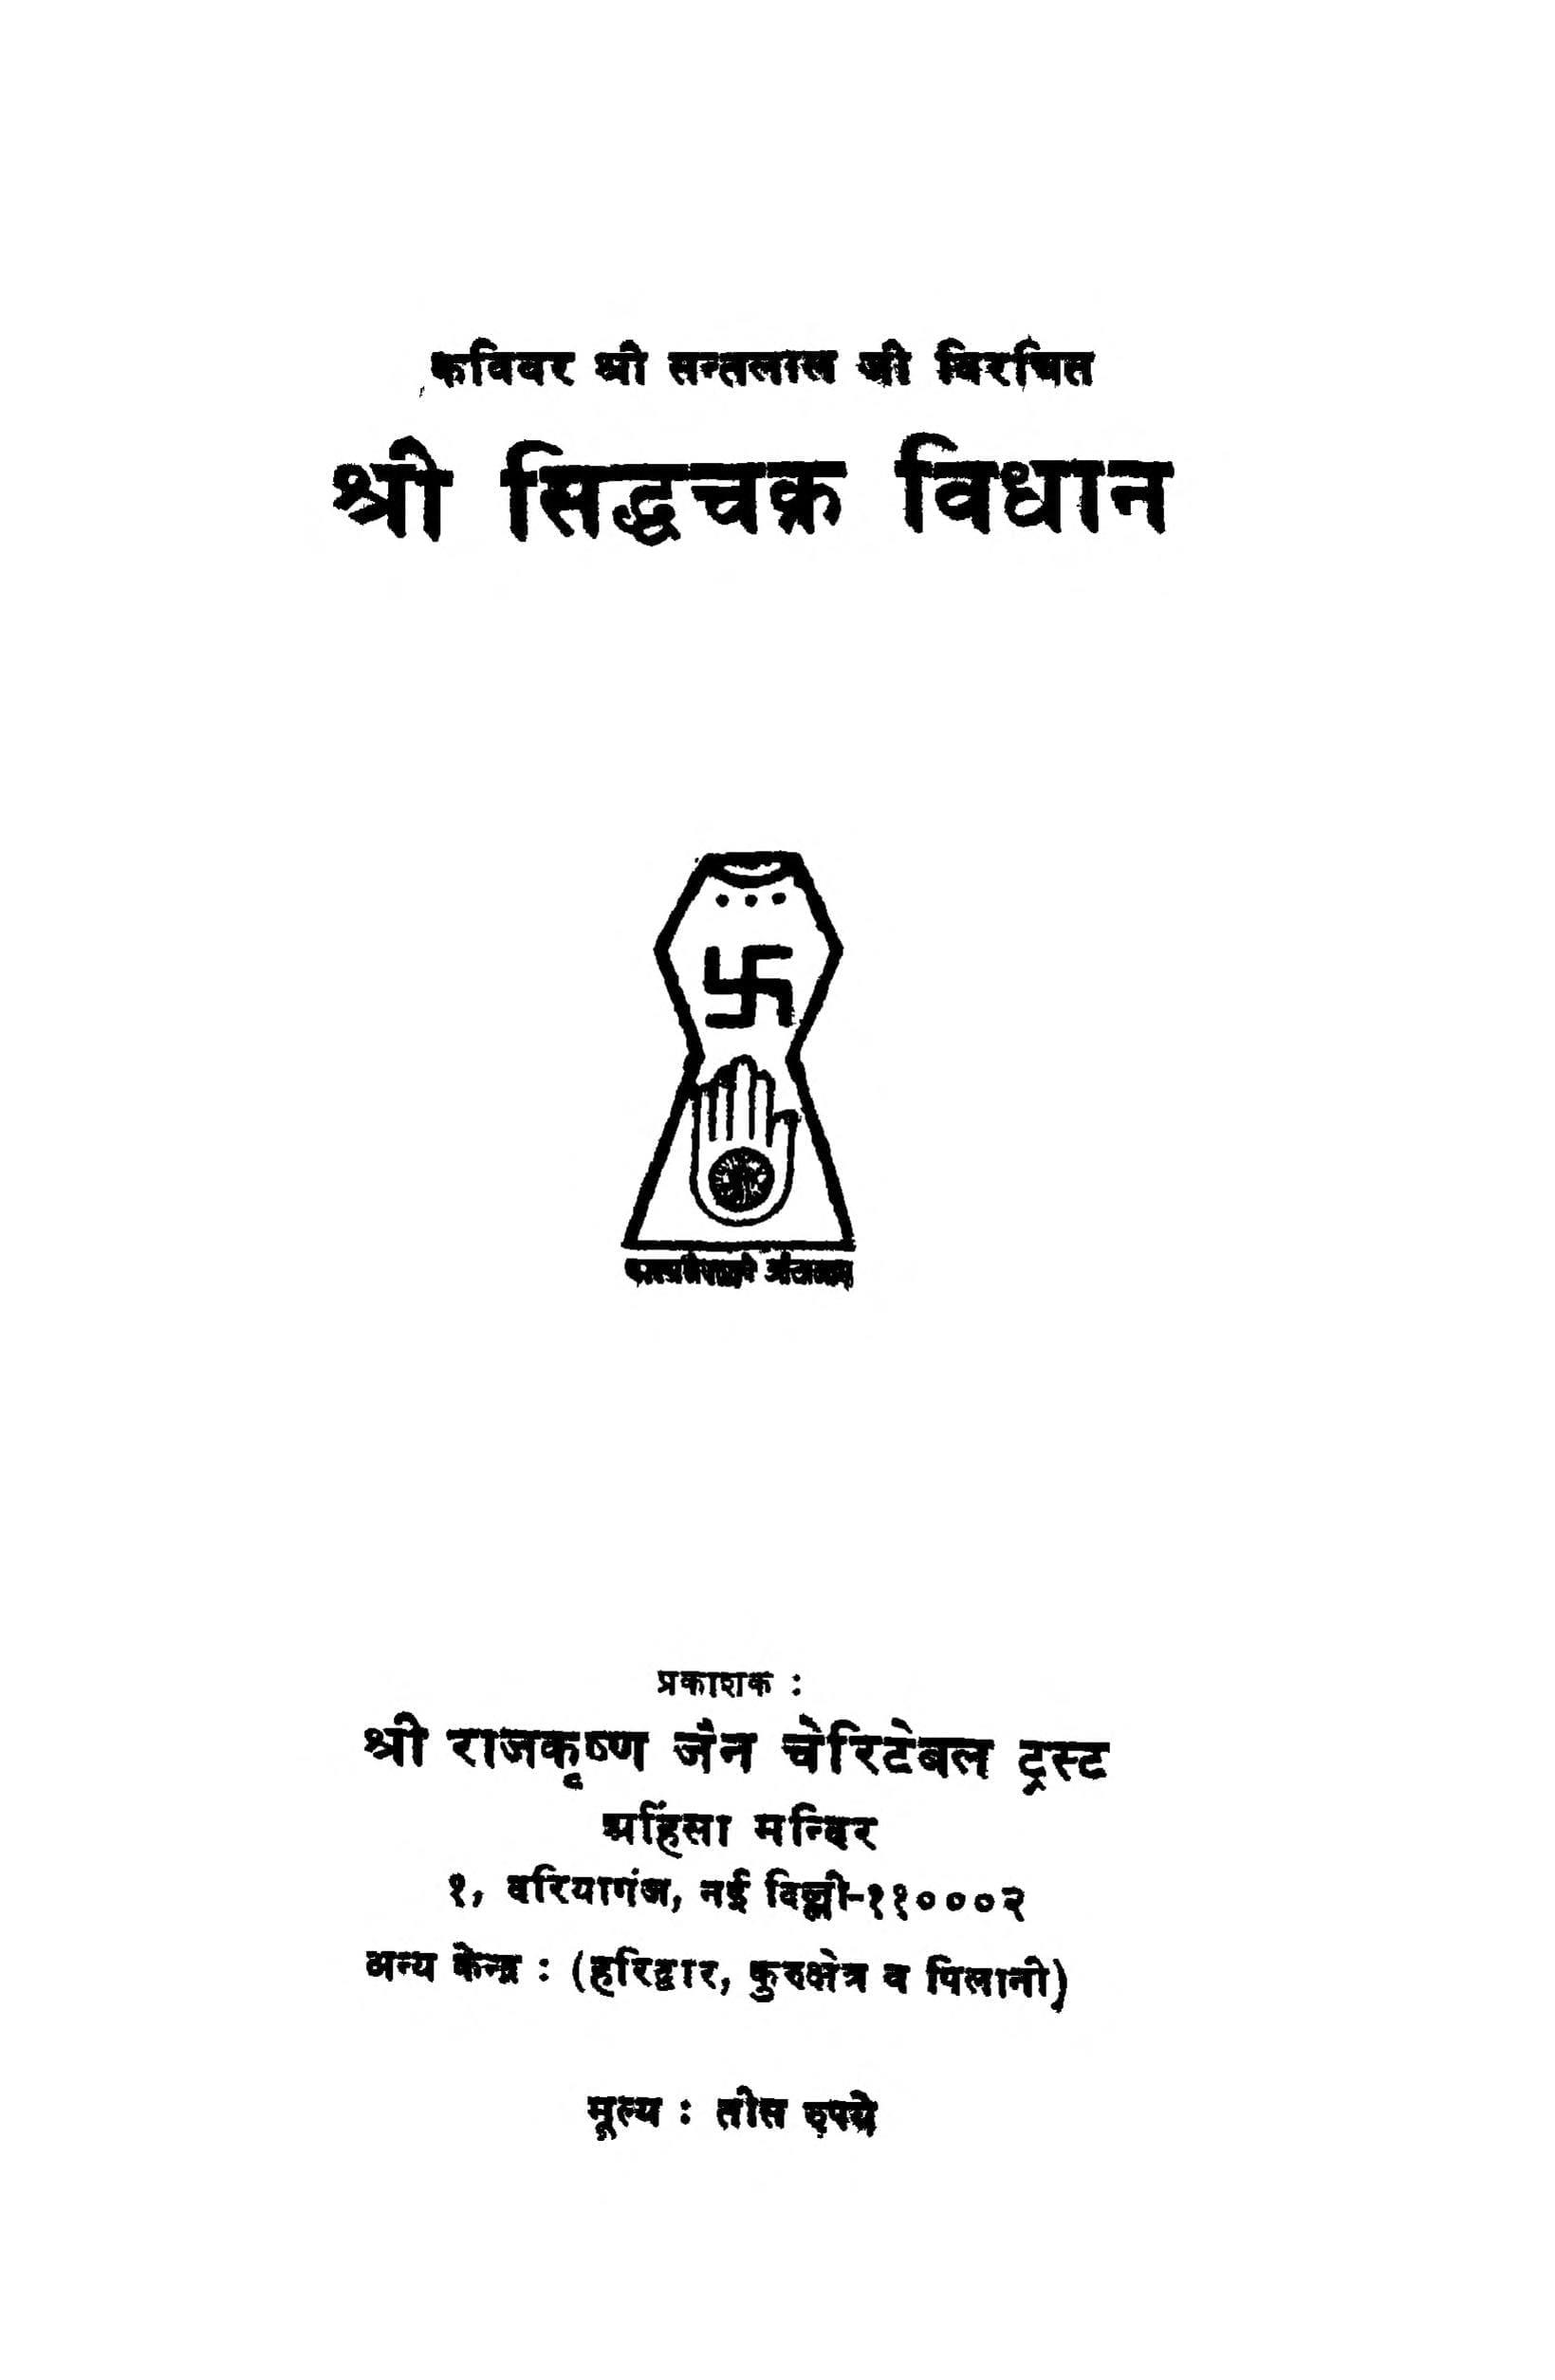 Sri Sidhchakra Vidhan  by श्री राजकृष्ण जैन - Shri Rajkrishna Jain